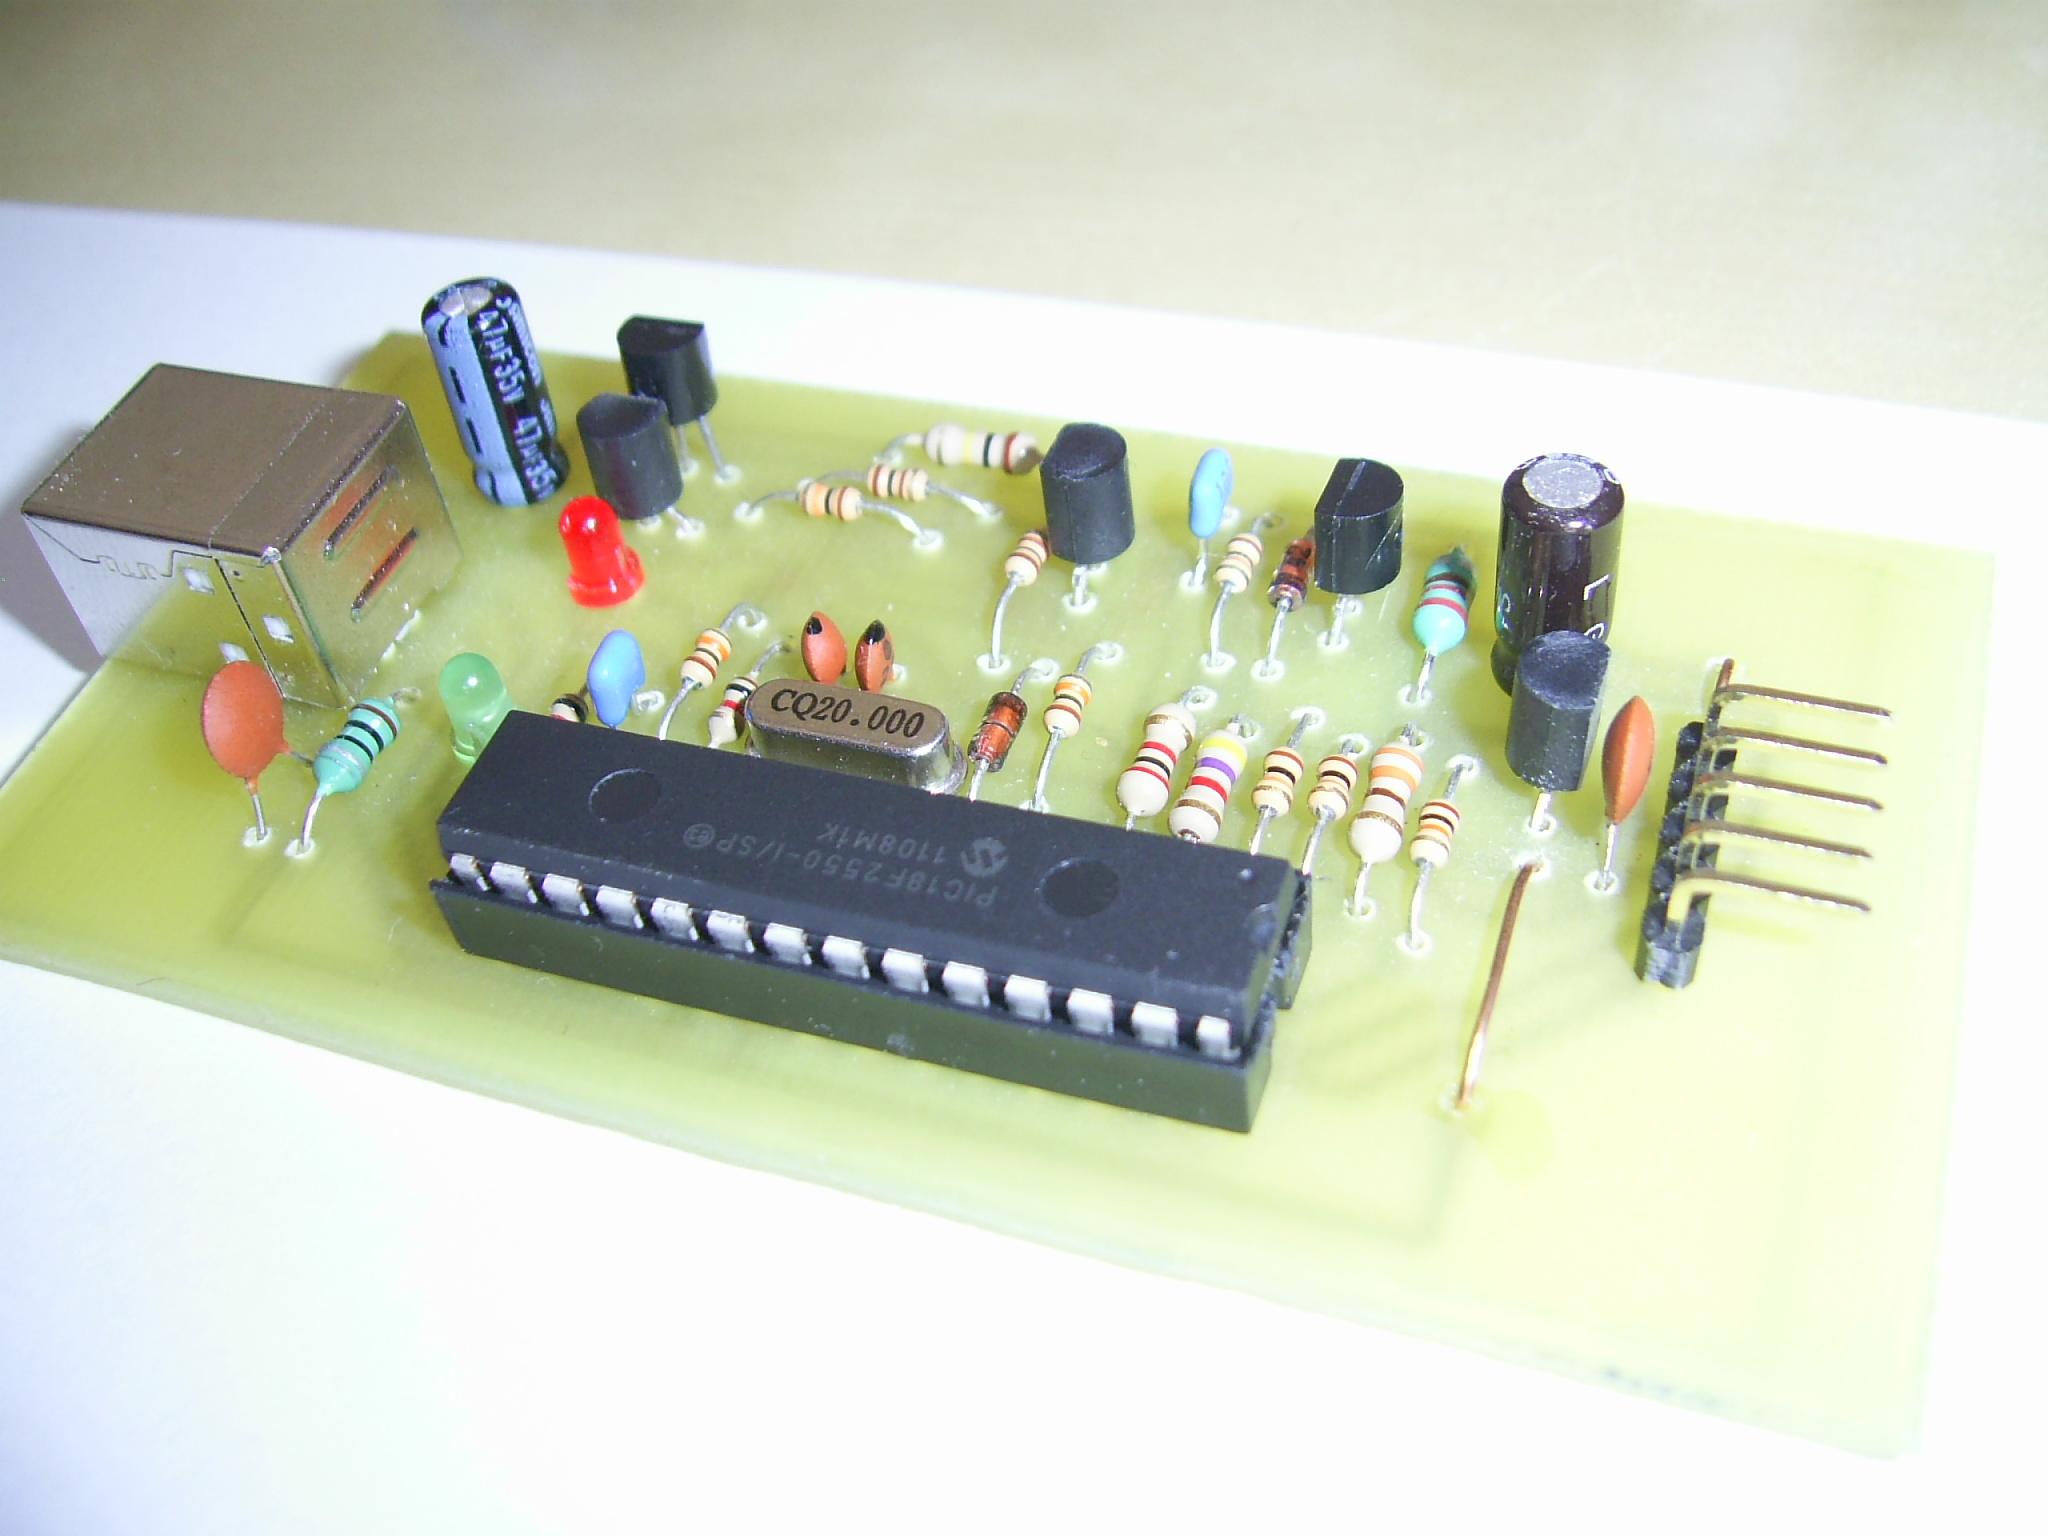 PIC Brenner8mini-P - DZIA�AJ�CY programator na USB